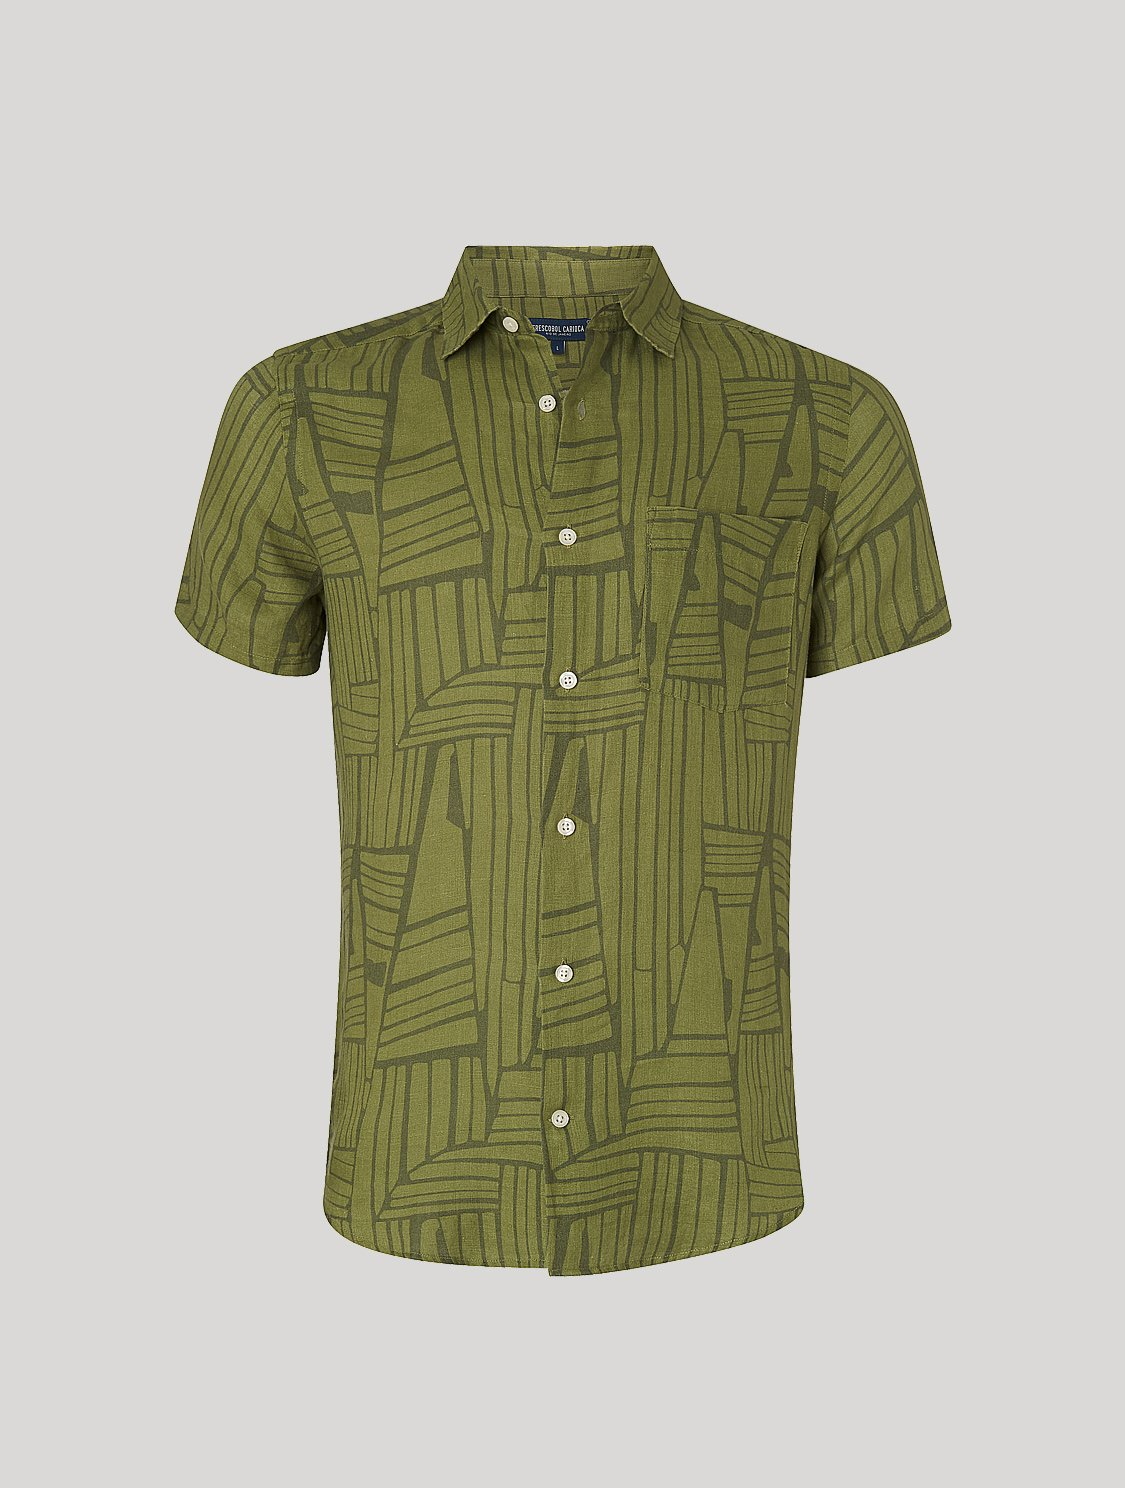 Tarsila Shirt Angles Print Olive M